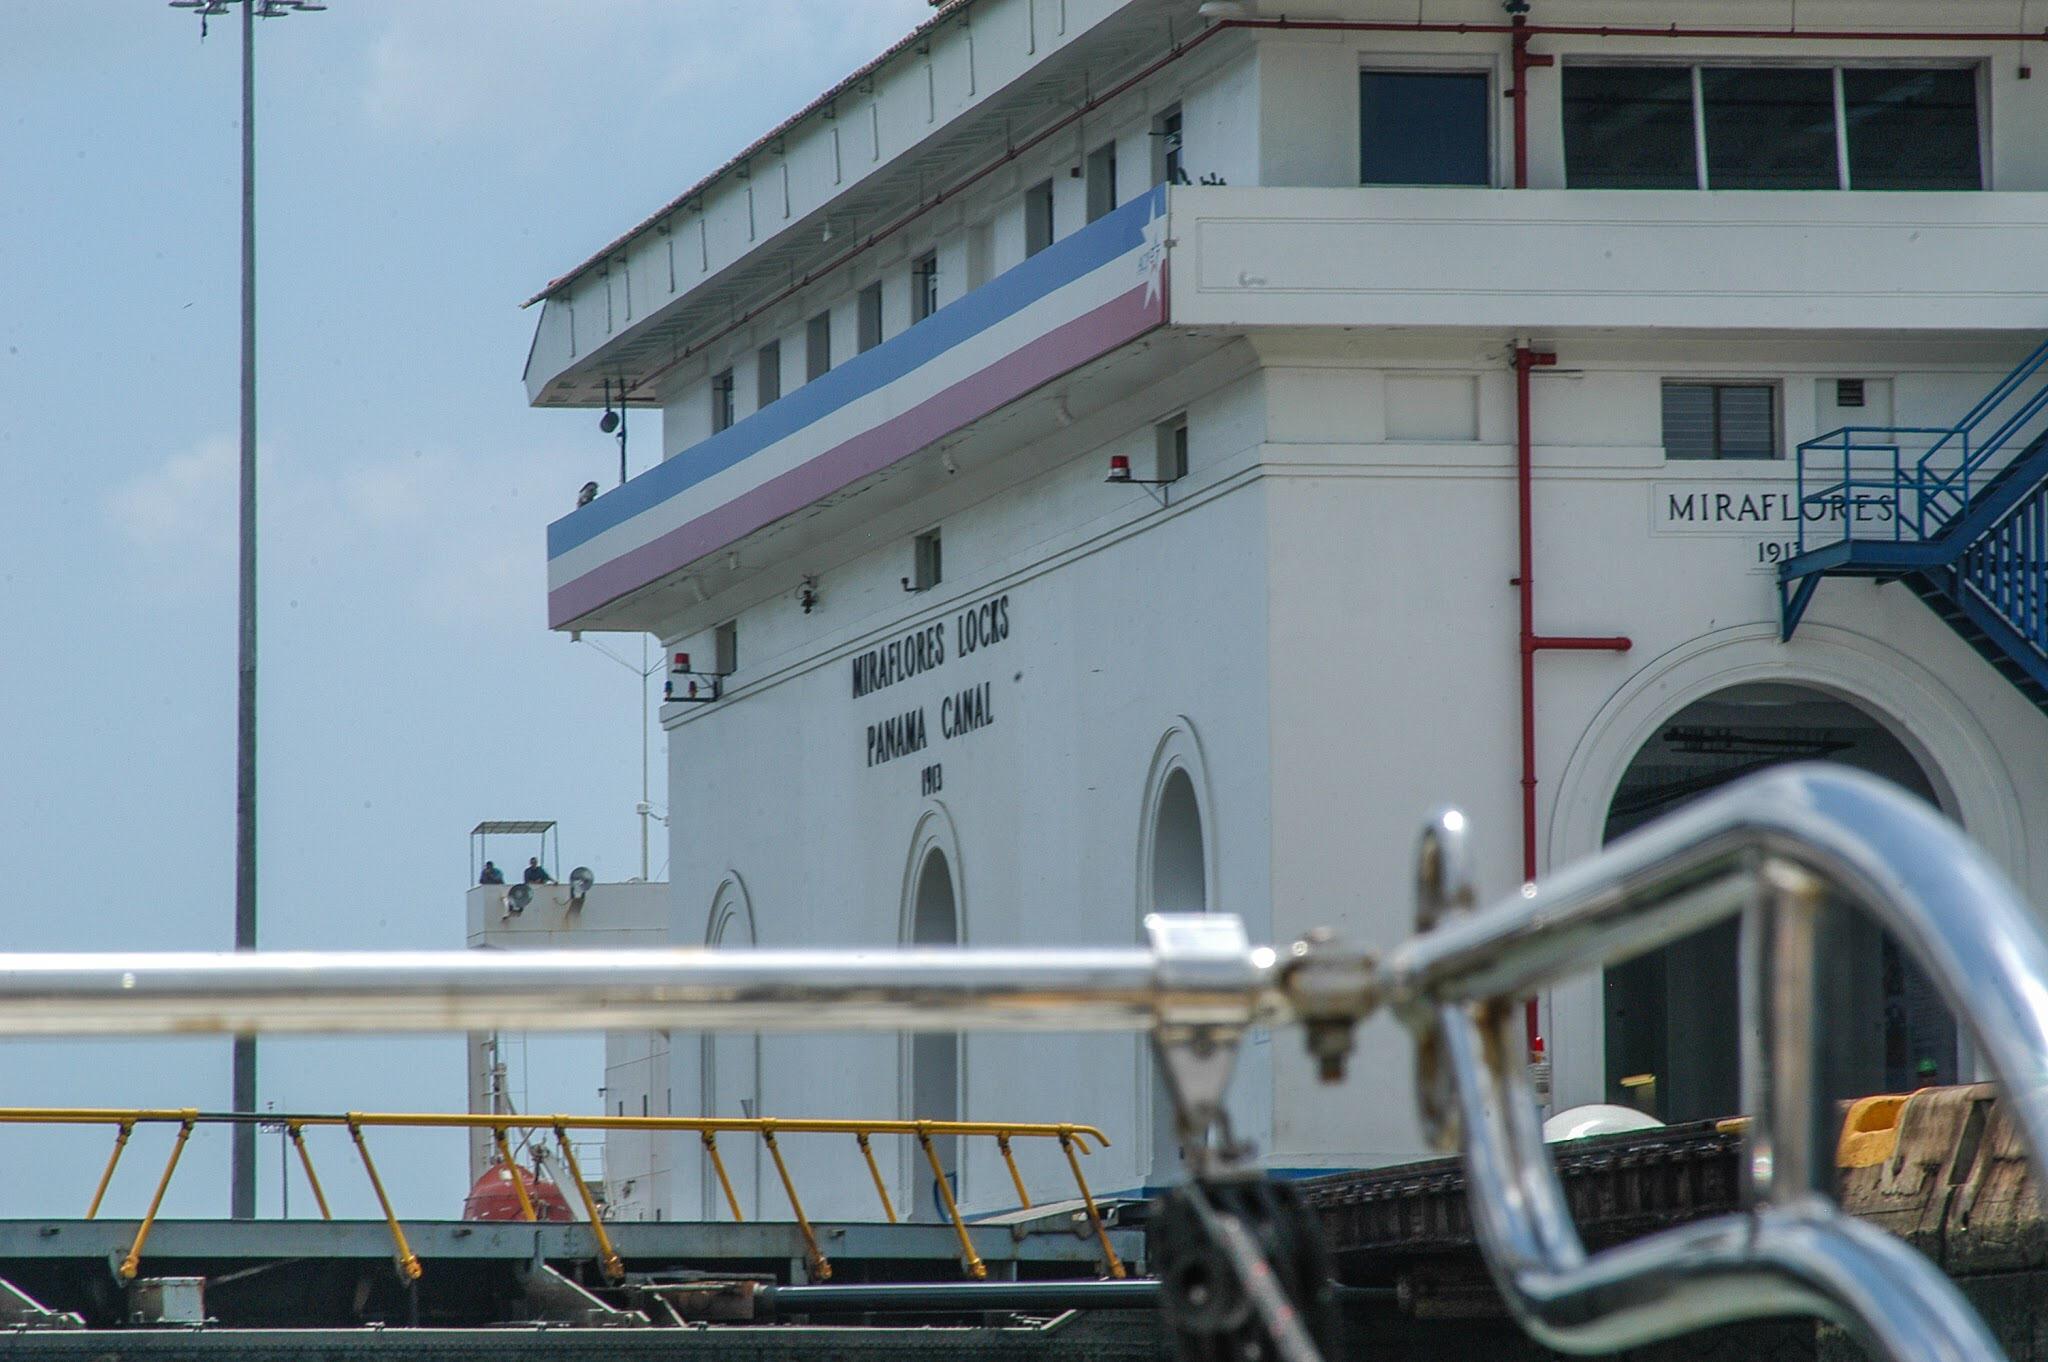 Movement Sailing - Panama Canal